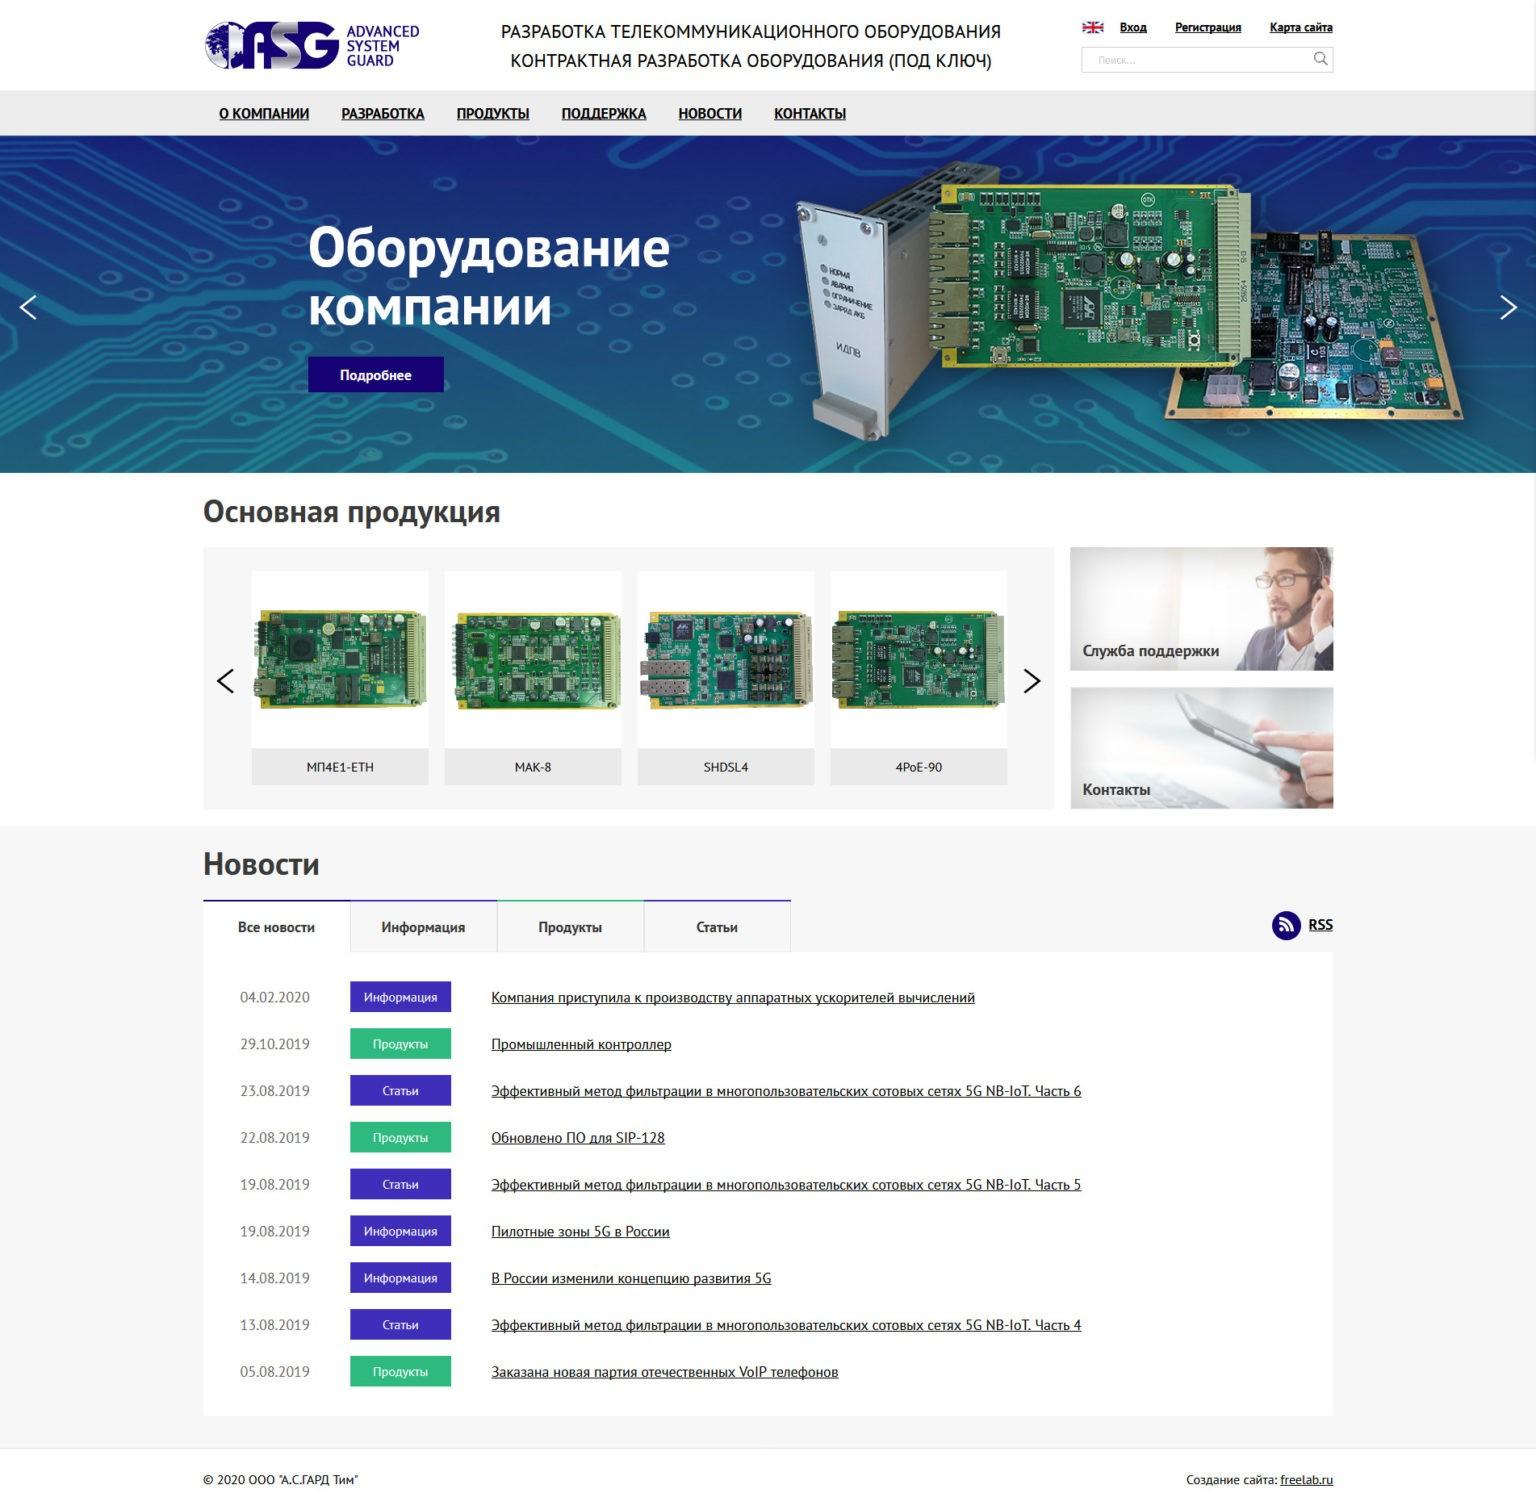 Screenshot_2020-03-09-Glavnaya-Asguard-1536×1510